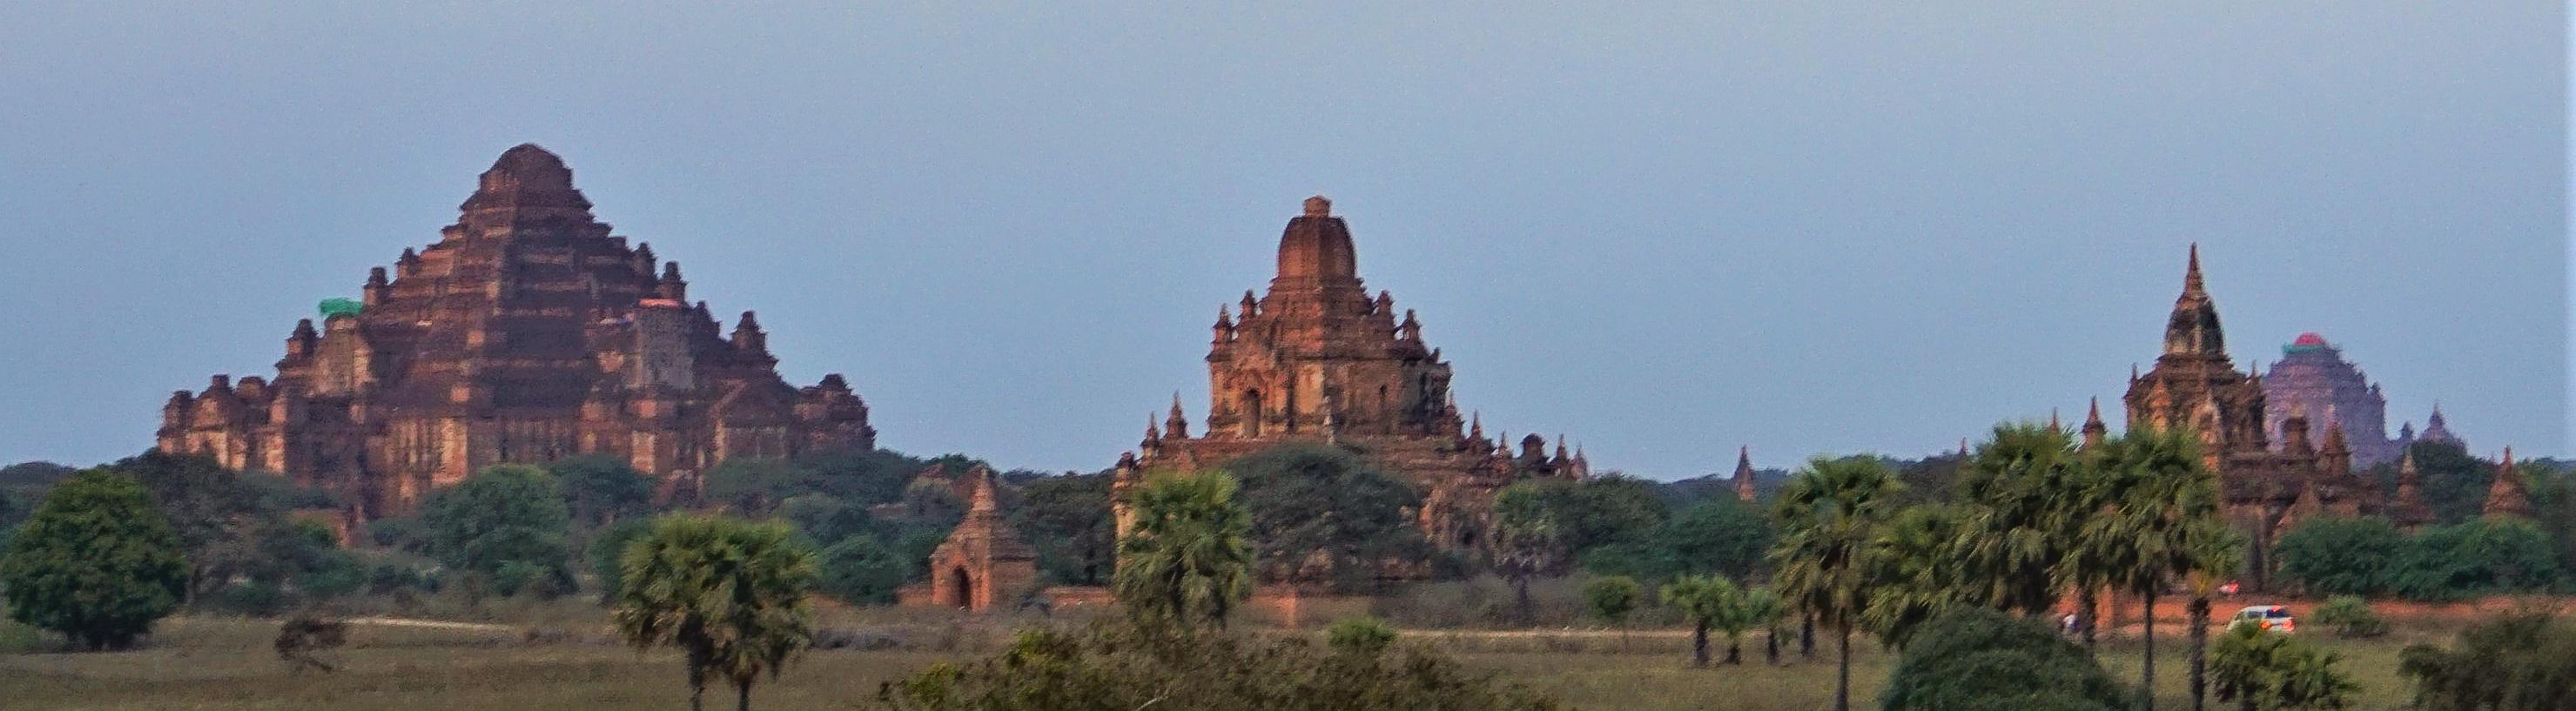 Bagan – The Adventures of Teagan